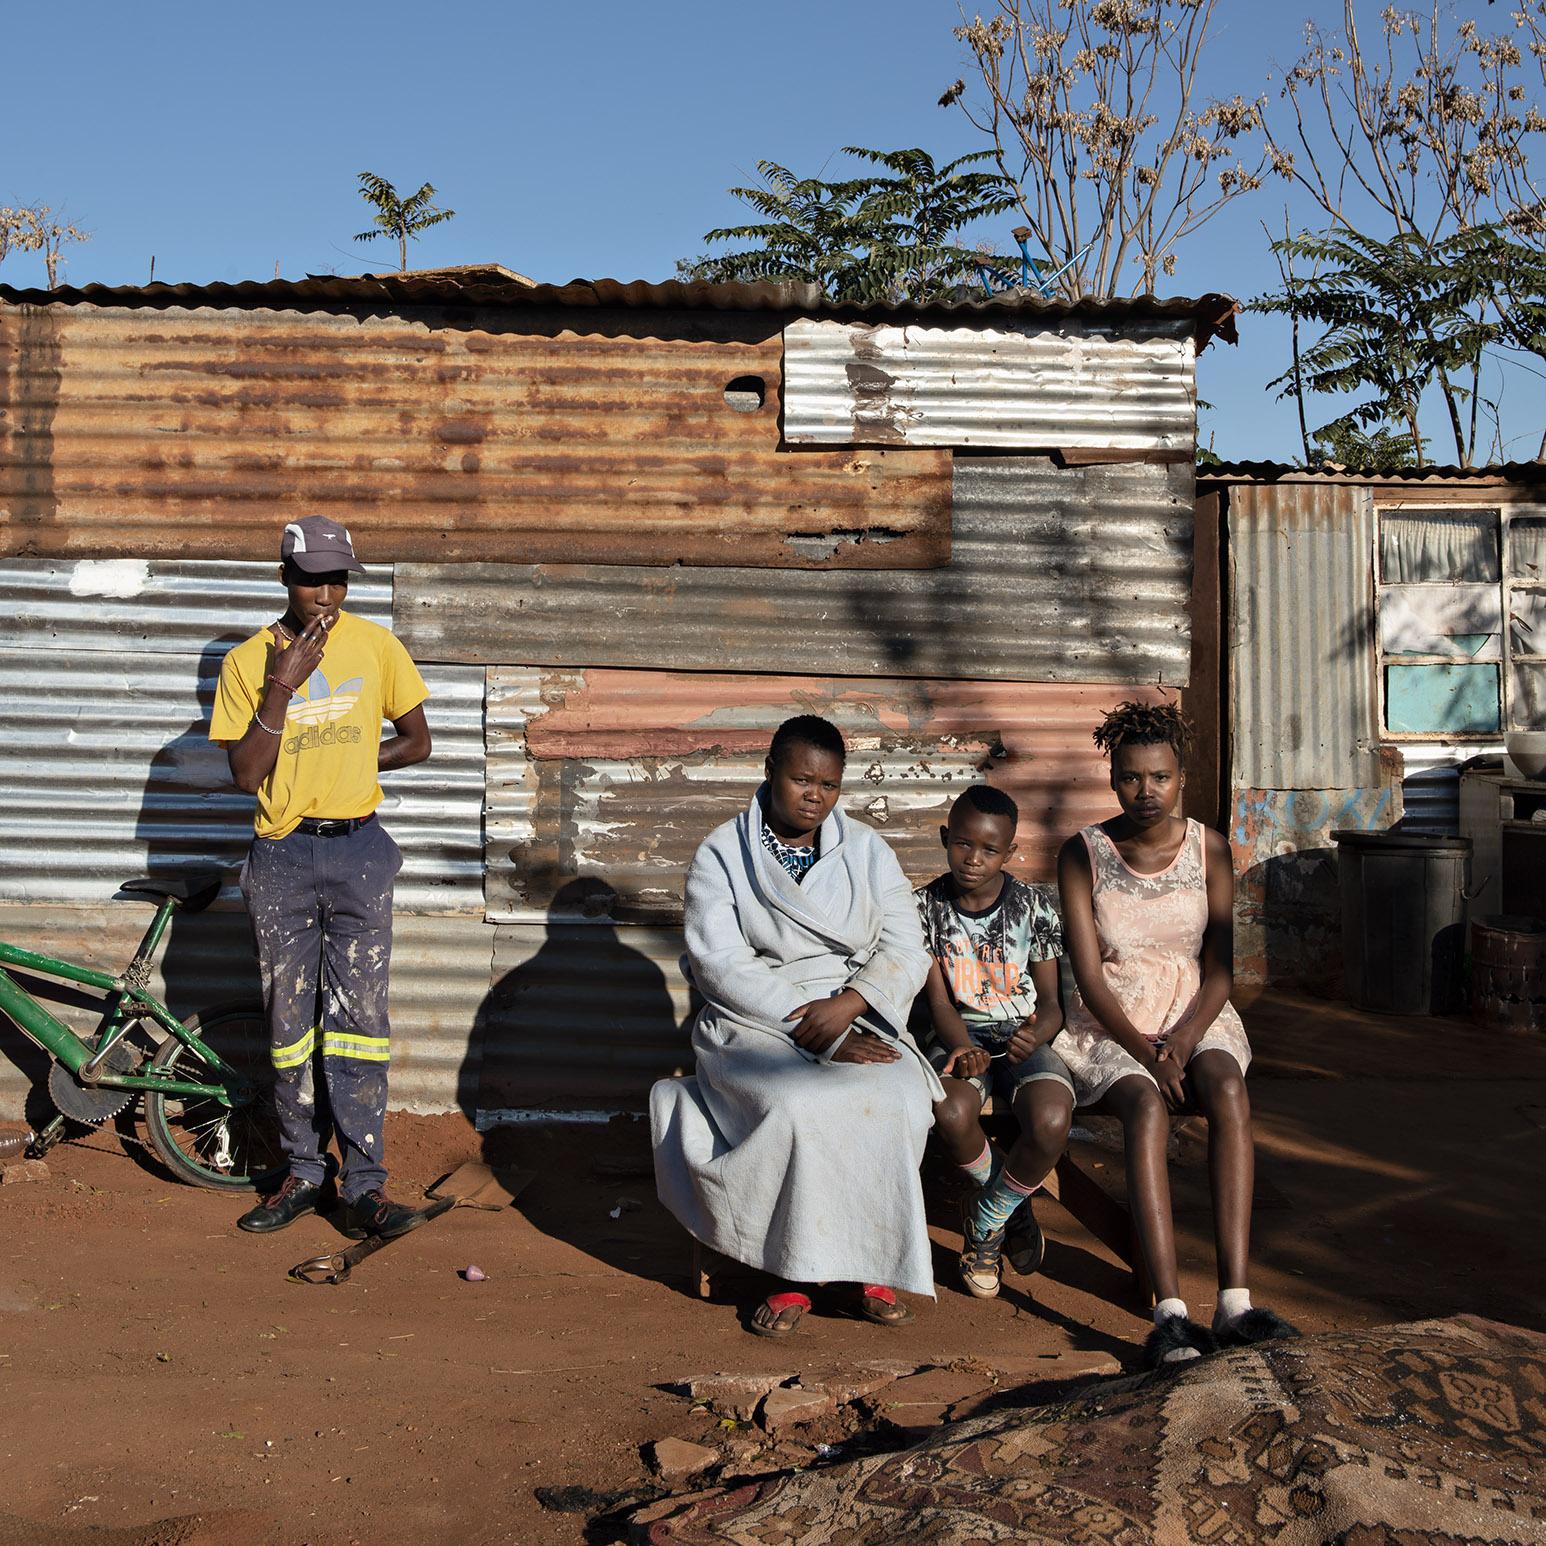 Lebohang Raethole, Boitumelo Mathibu and Her Kids. Waterworks, Soweto, 2020 © Jabulani Dhlamini and Goodman Gallery London, Johannesburg, Cape Town